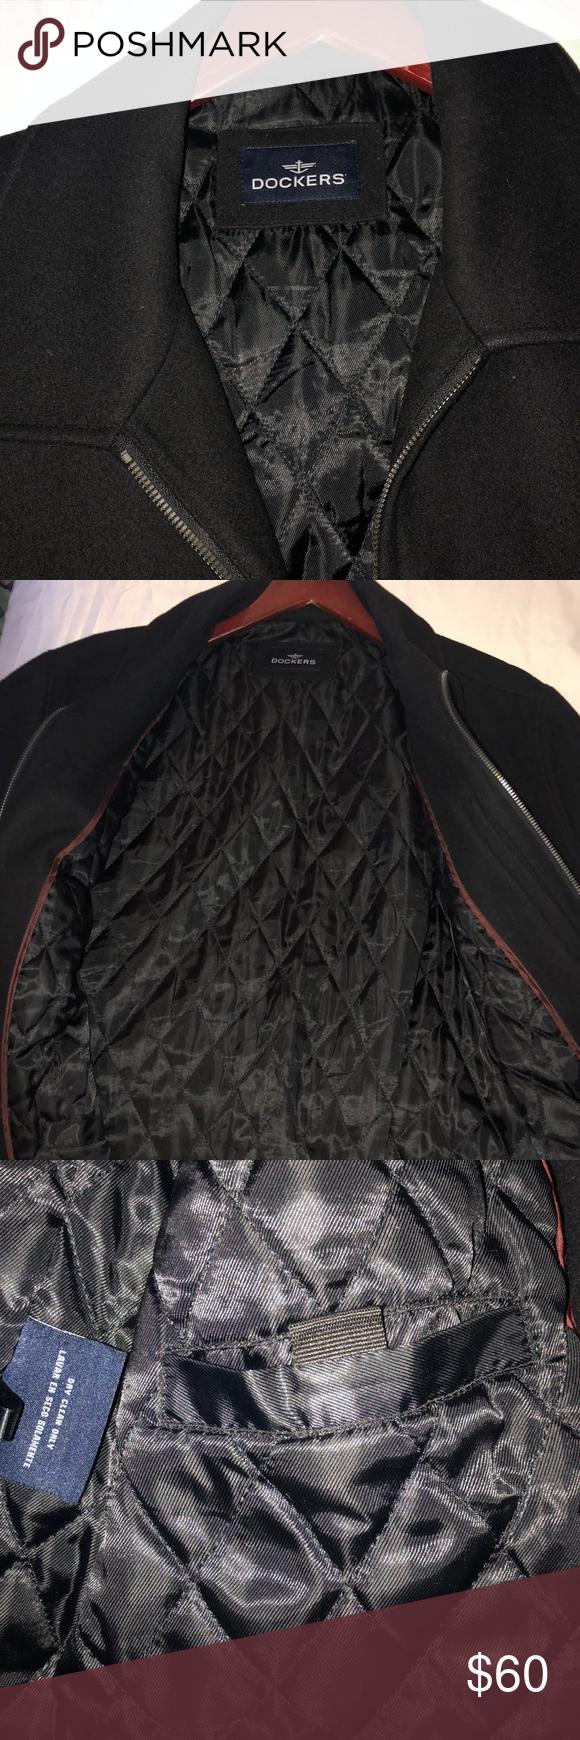 Dockers Jacket XL Black Fashion, Clothes design, Jackets